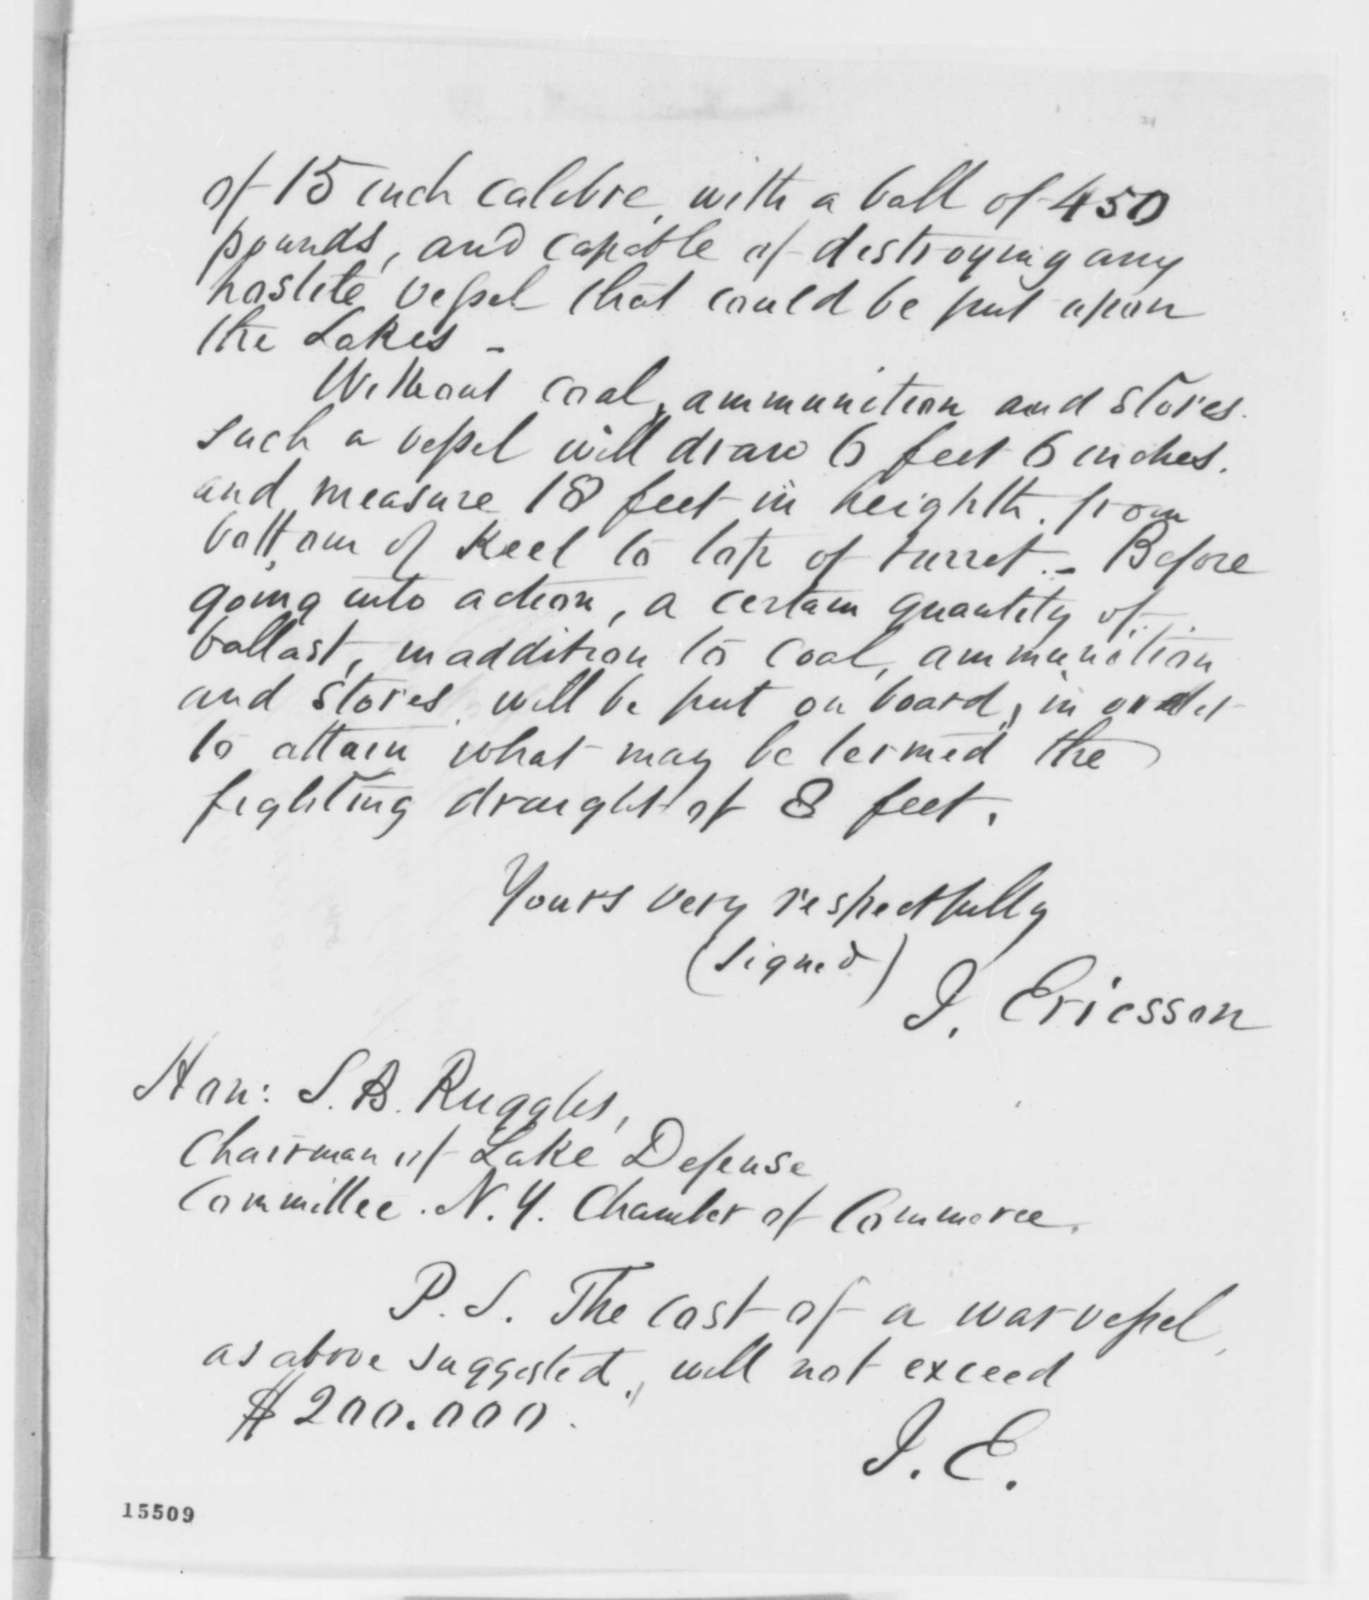 John Ericsson to S. B. Ruggles, Monday, April 14, 1862  (Ironclad vessel)